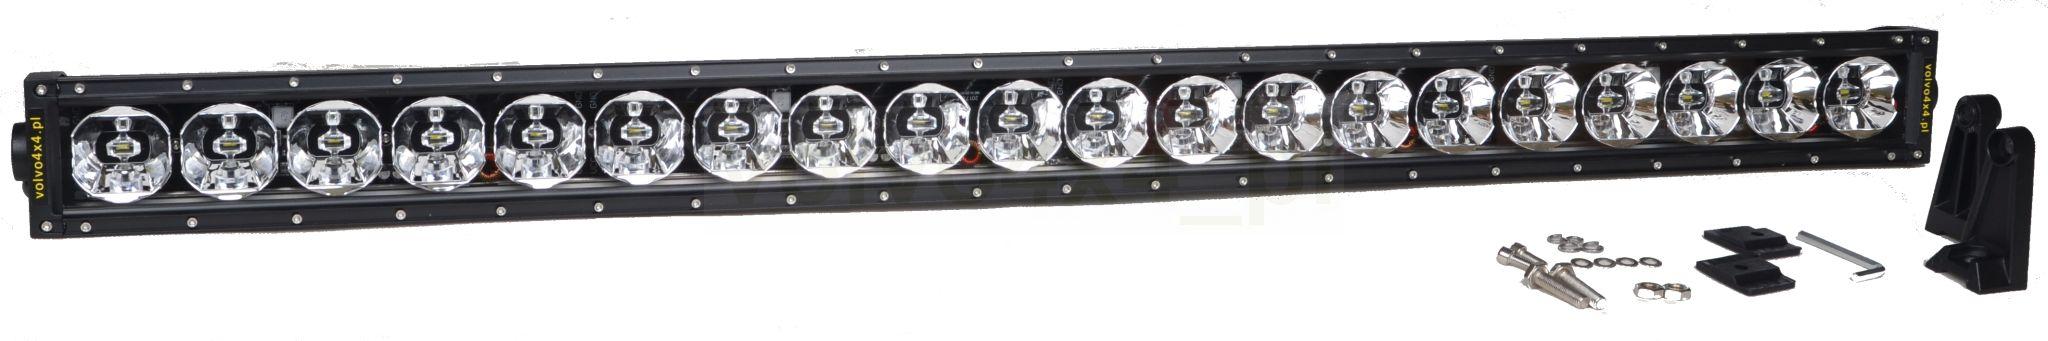 панель галоген планка 20x led 200w cree 1224v 4x4